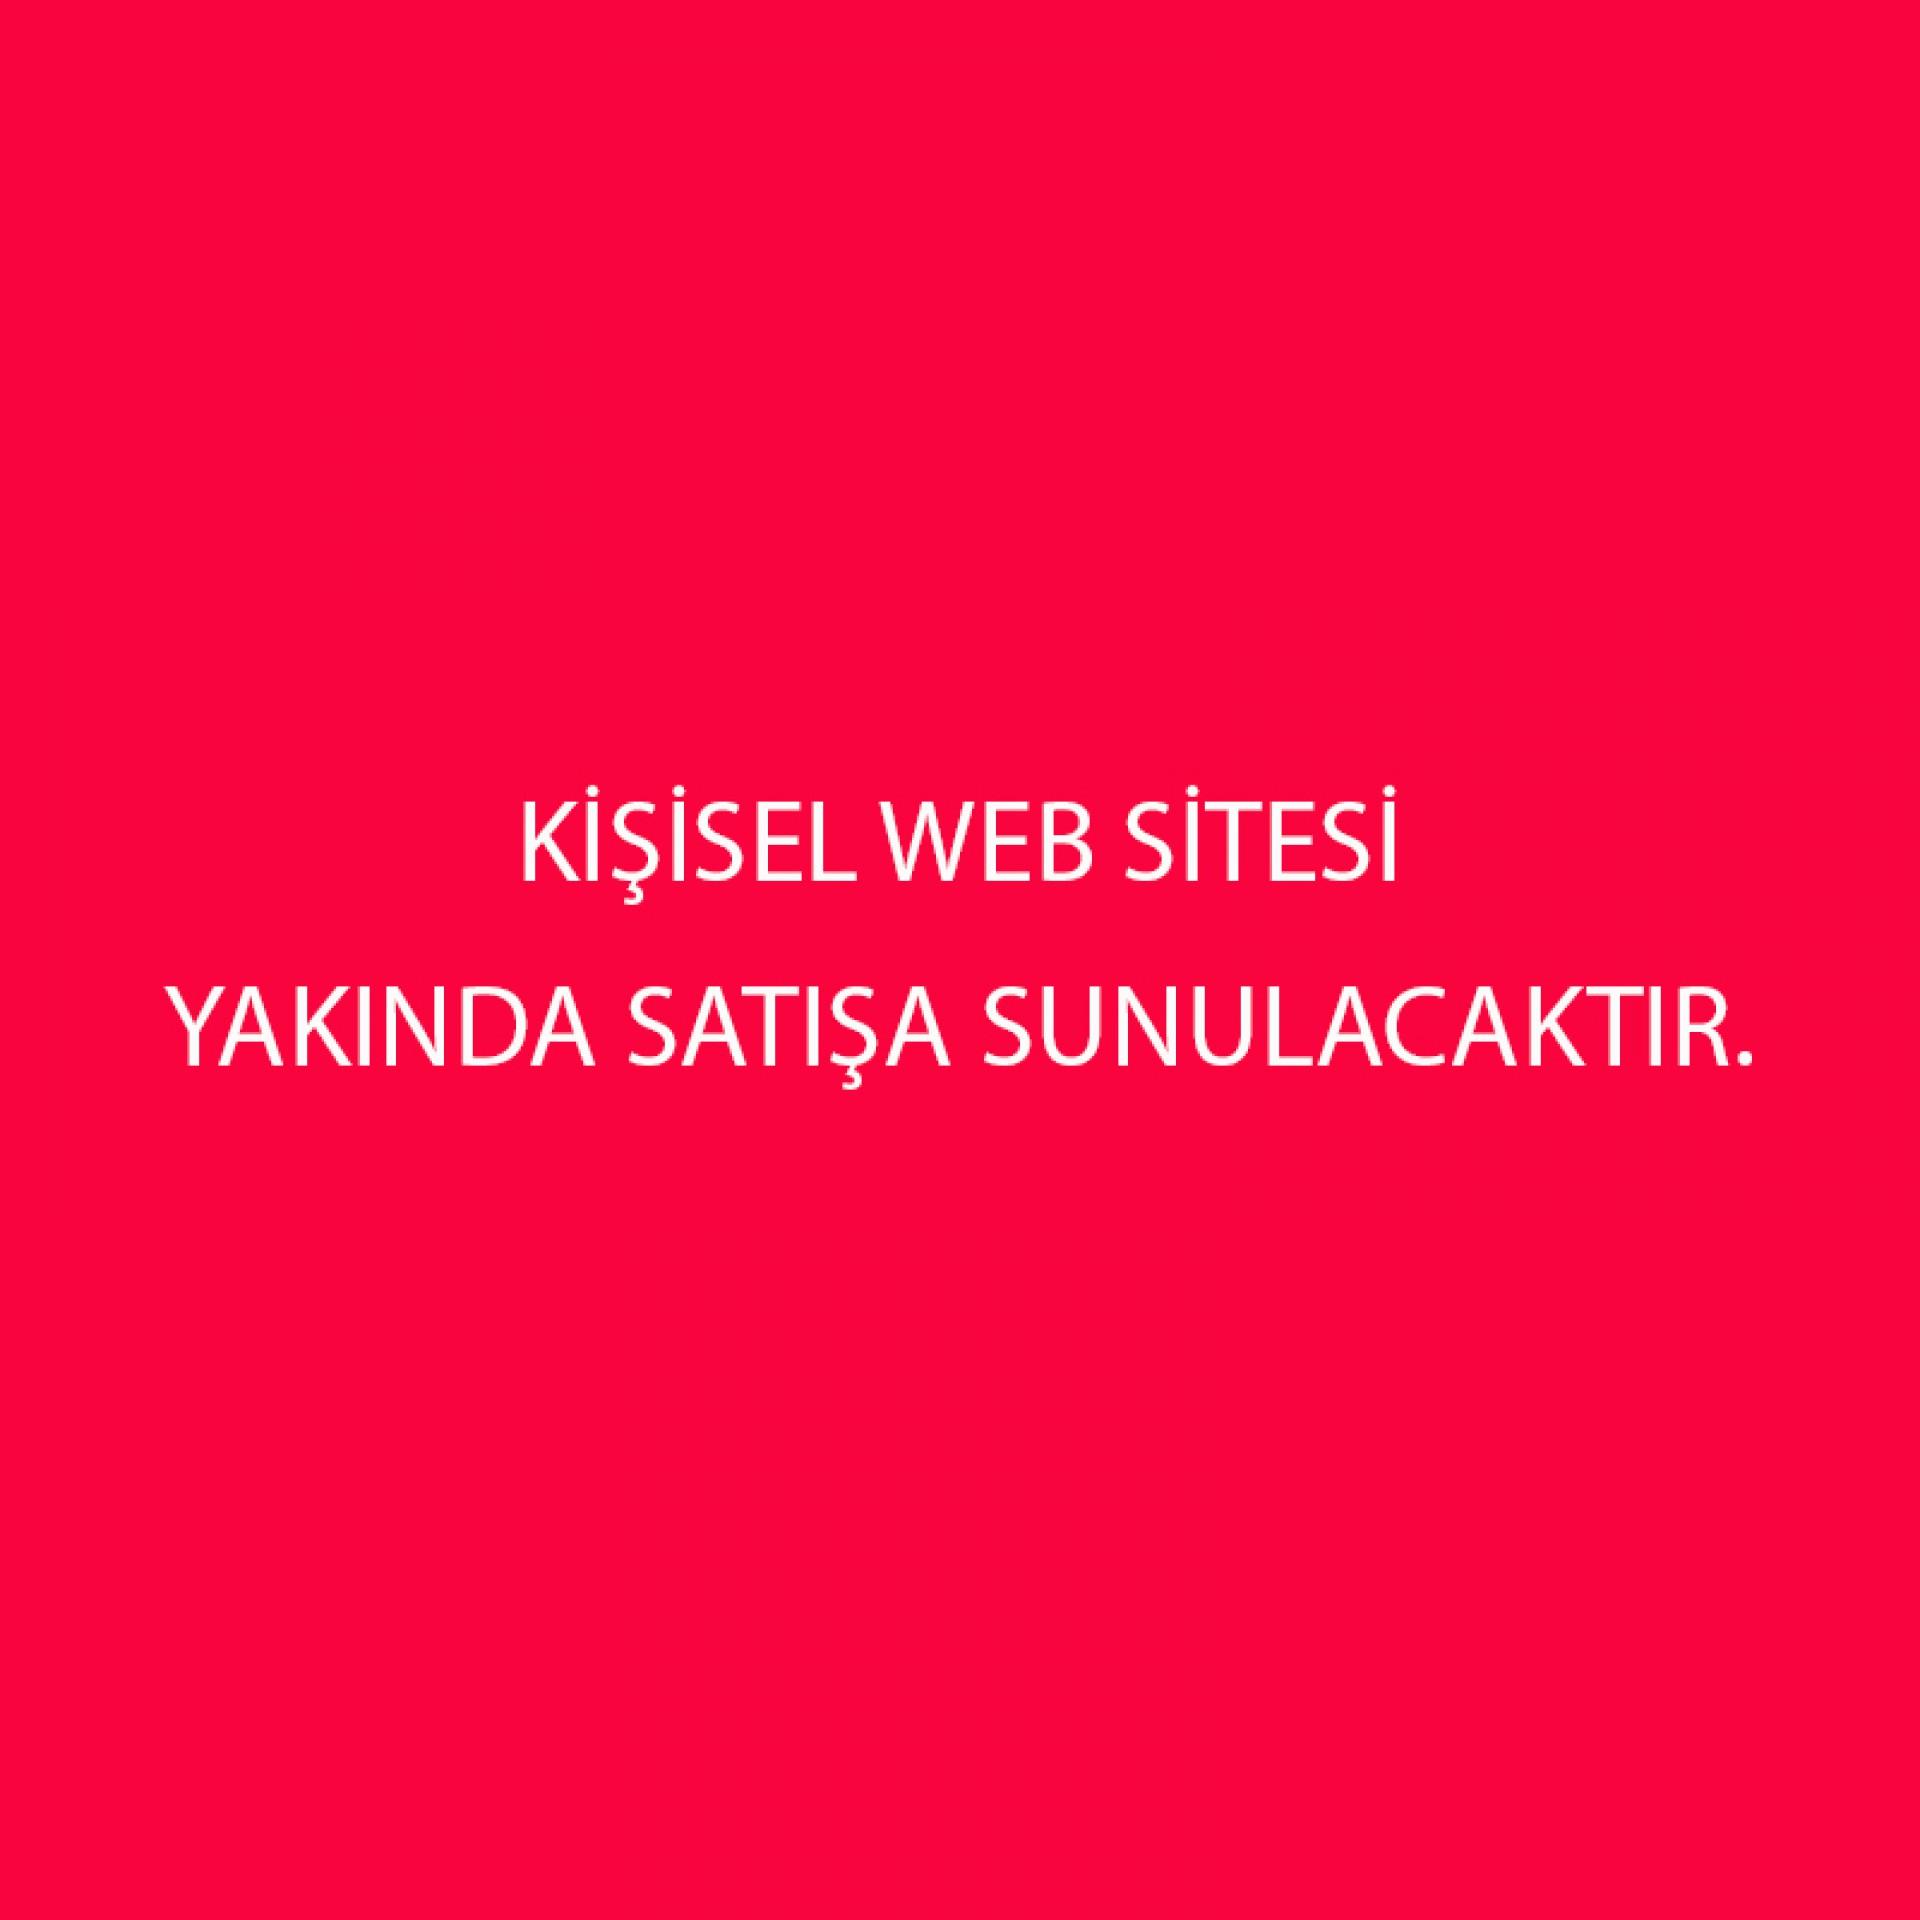 KİSİSEL WEBSİTE